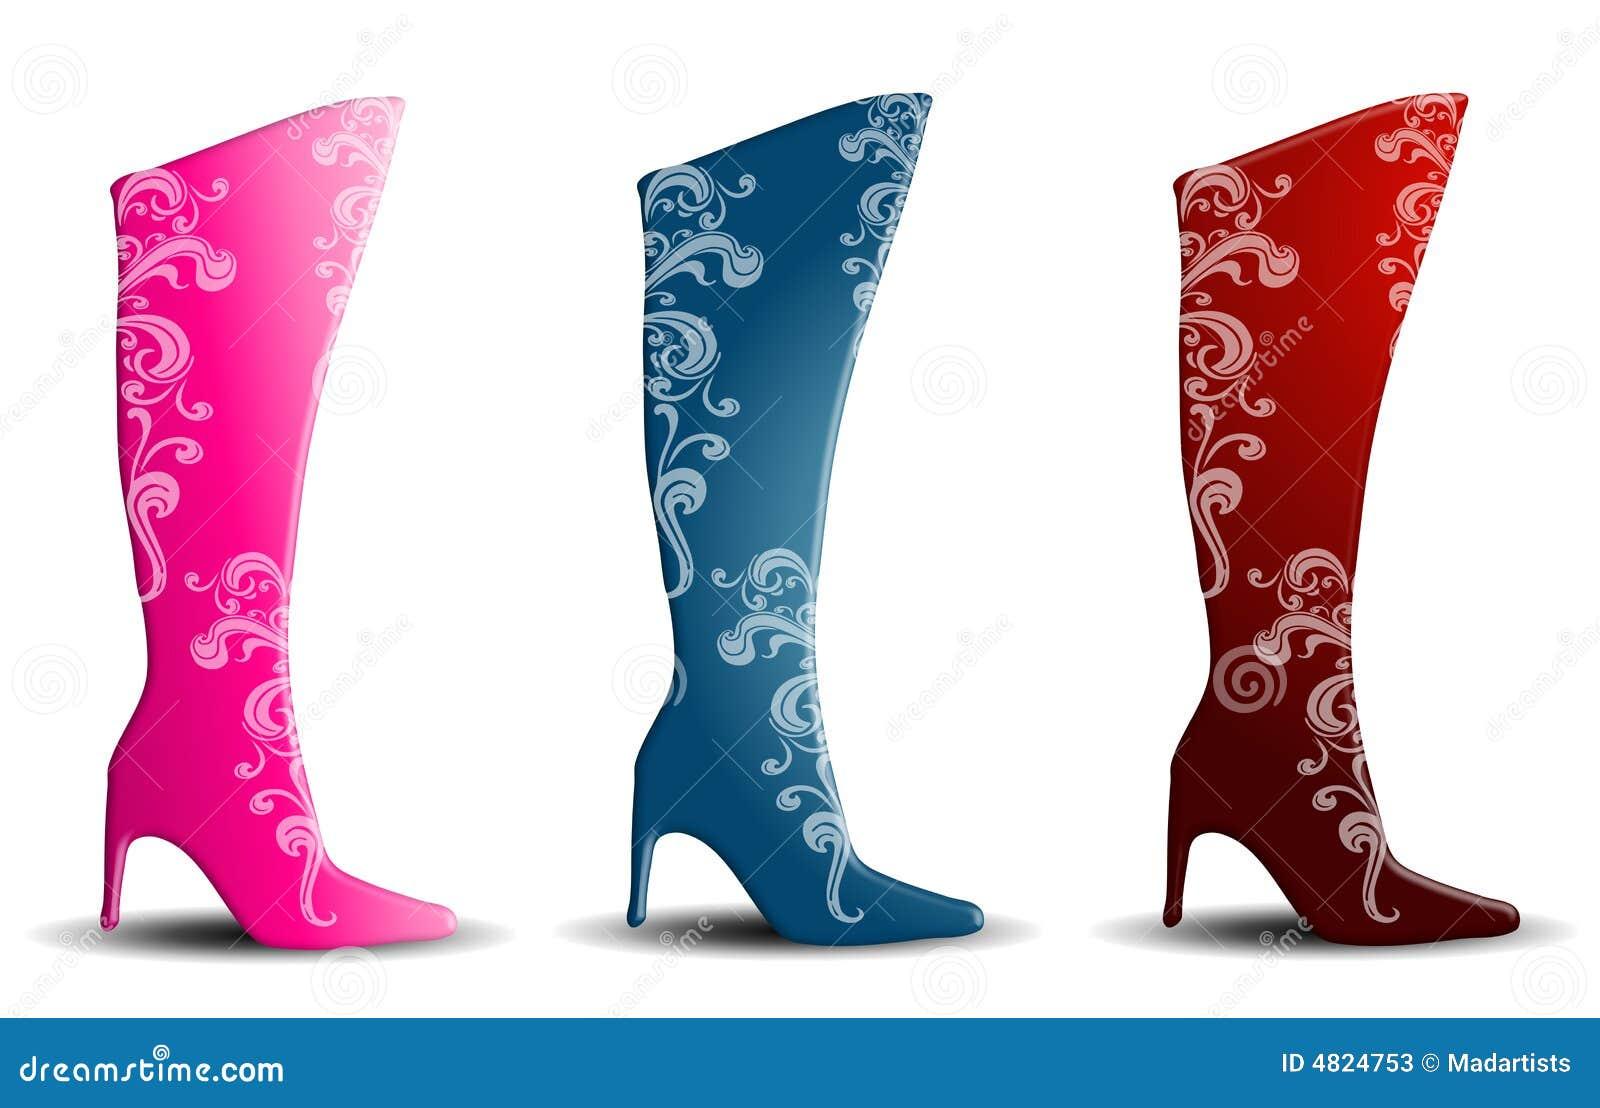 High Heel Pink Boots